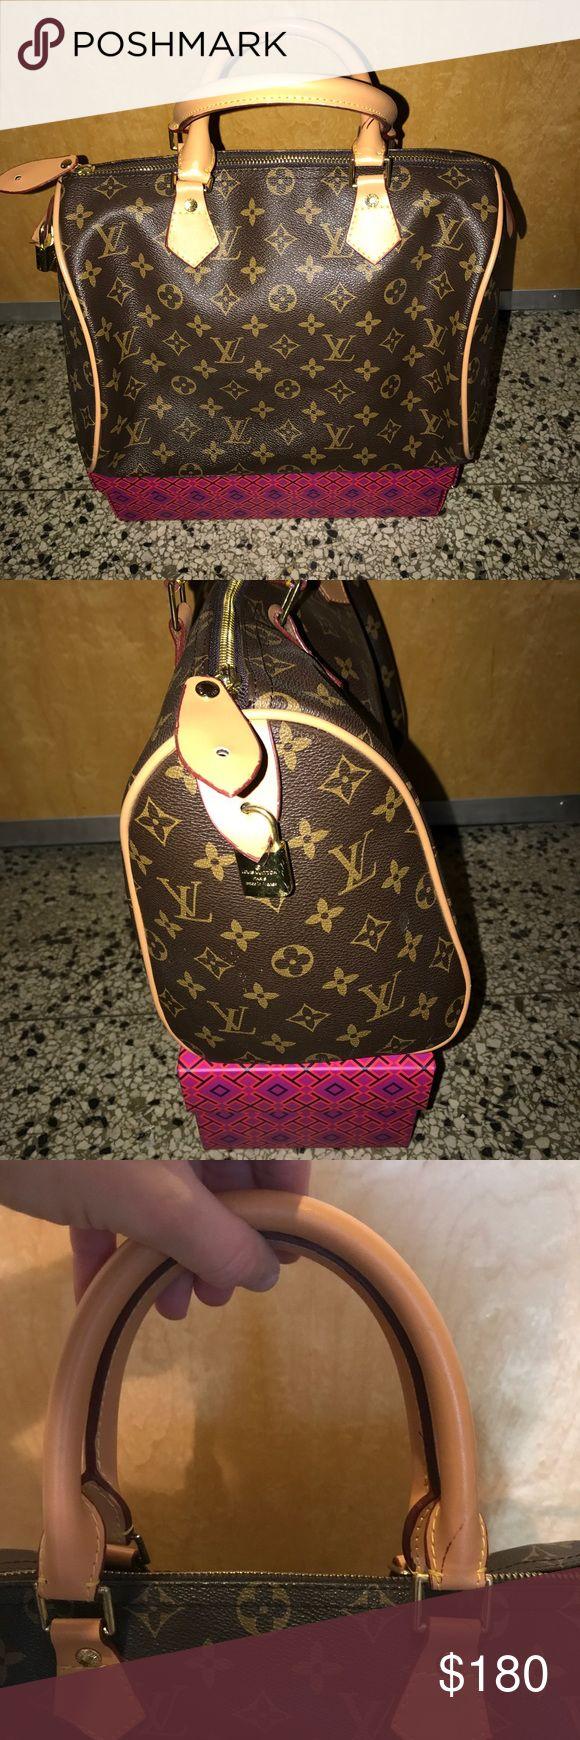 Louis Vuitton speedy handbag Louis Vuitton speedy handbag - used a couple of times - price reflects authenticity** Louis Vuitton Bags Satchels